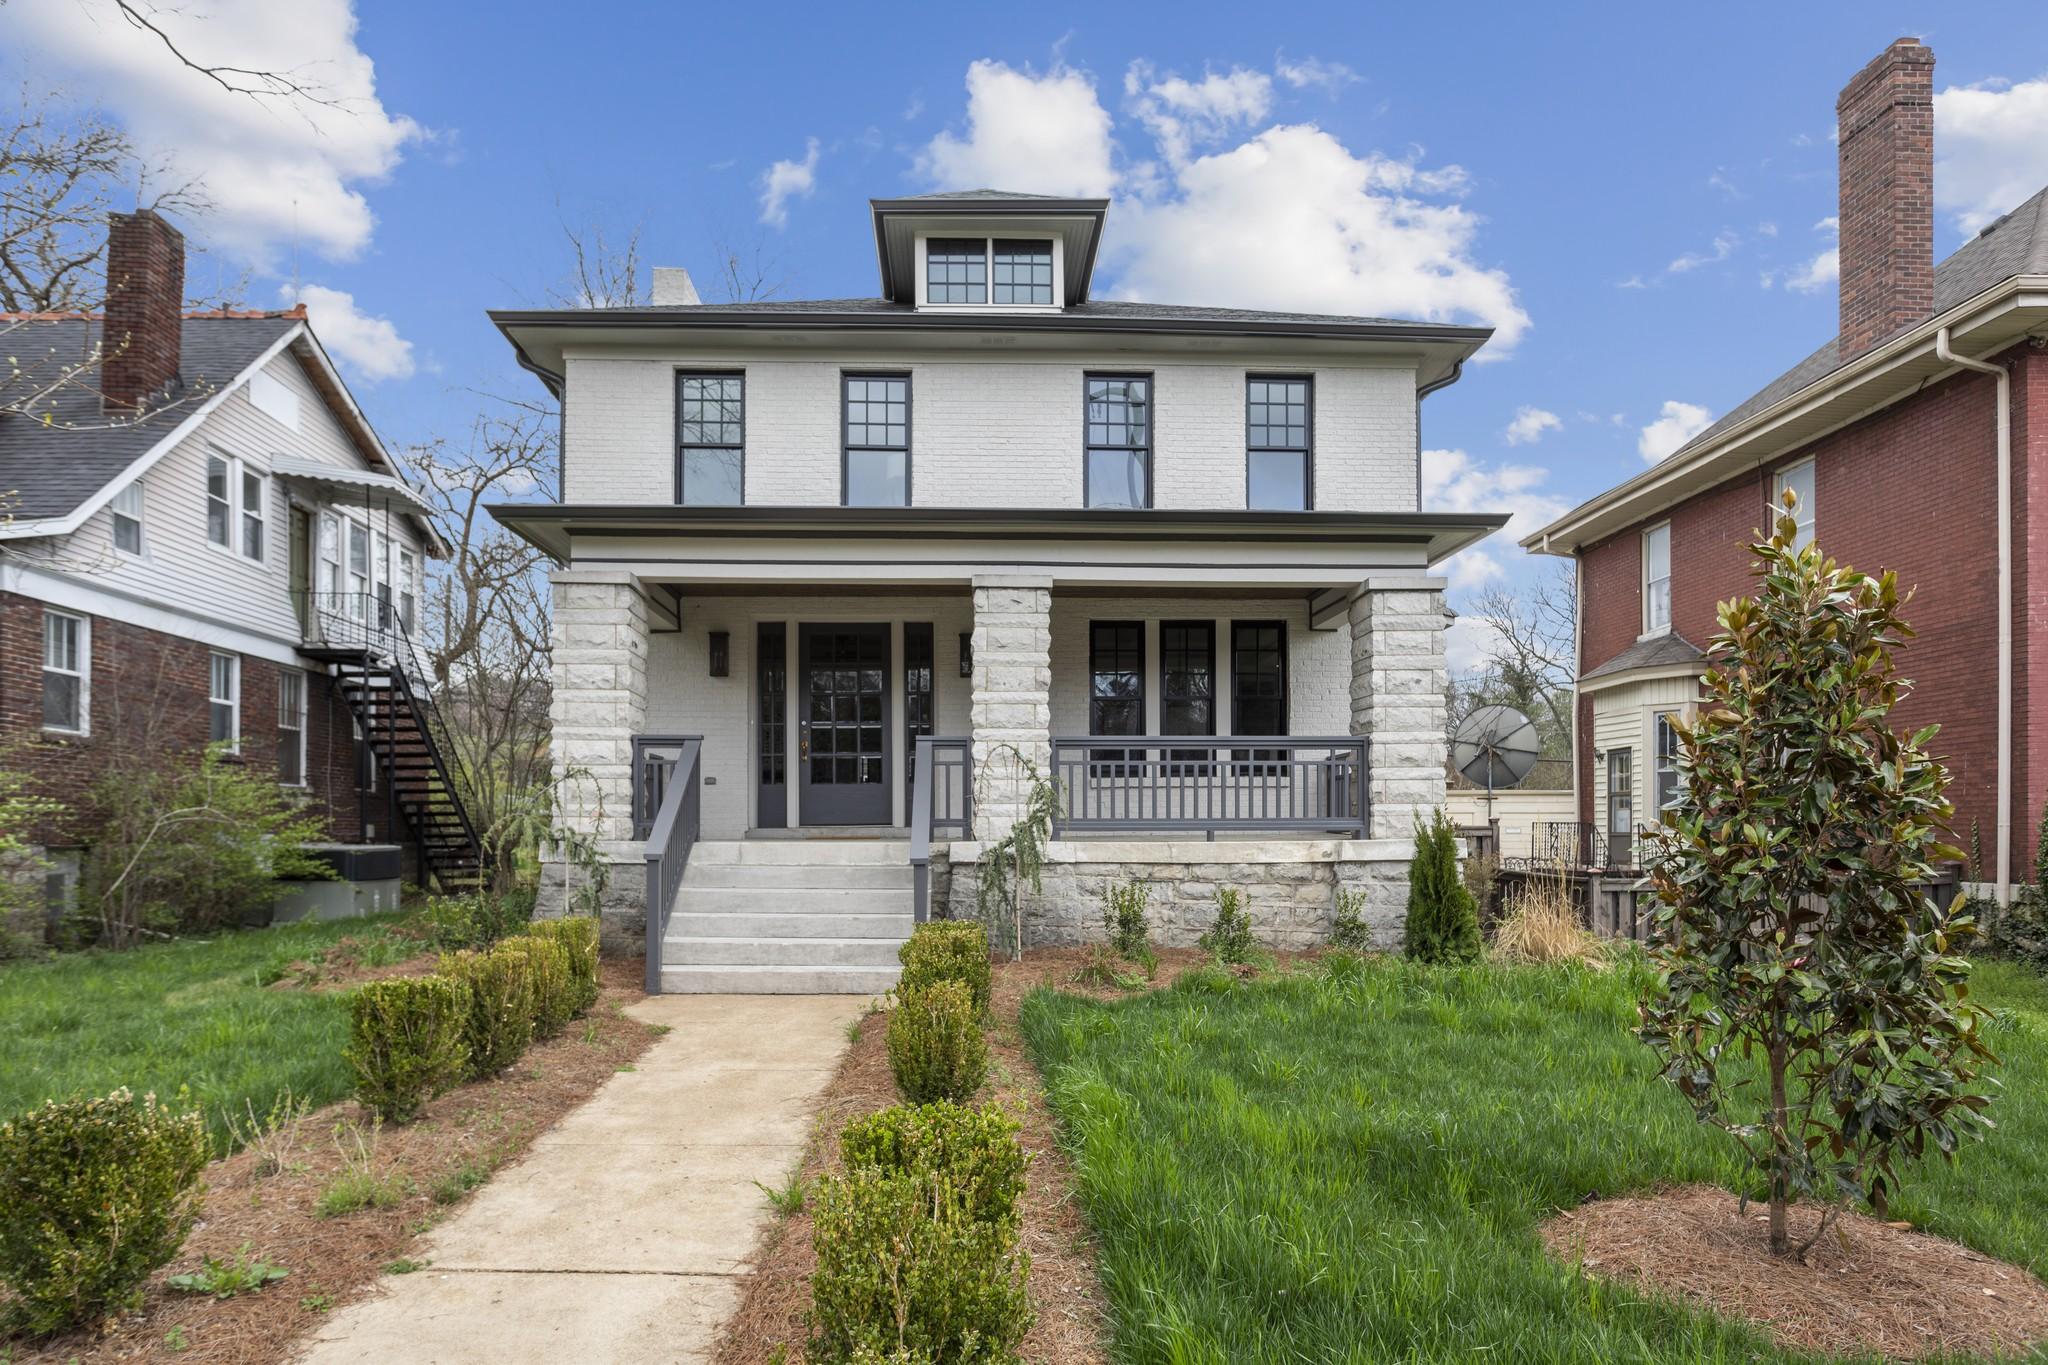 2302 Belmont Blvd Property Photo - Nashville, TN real estate listing